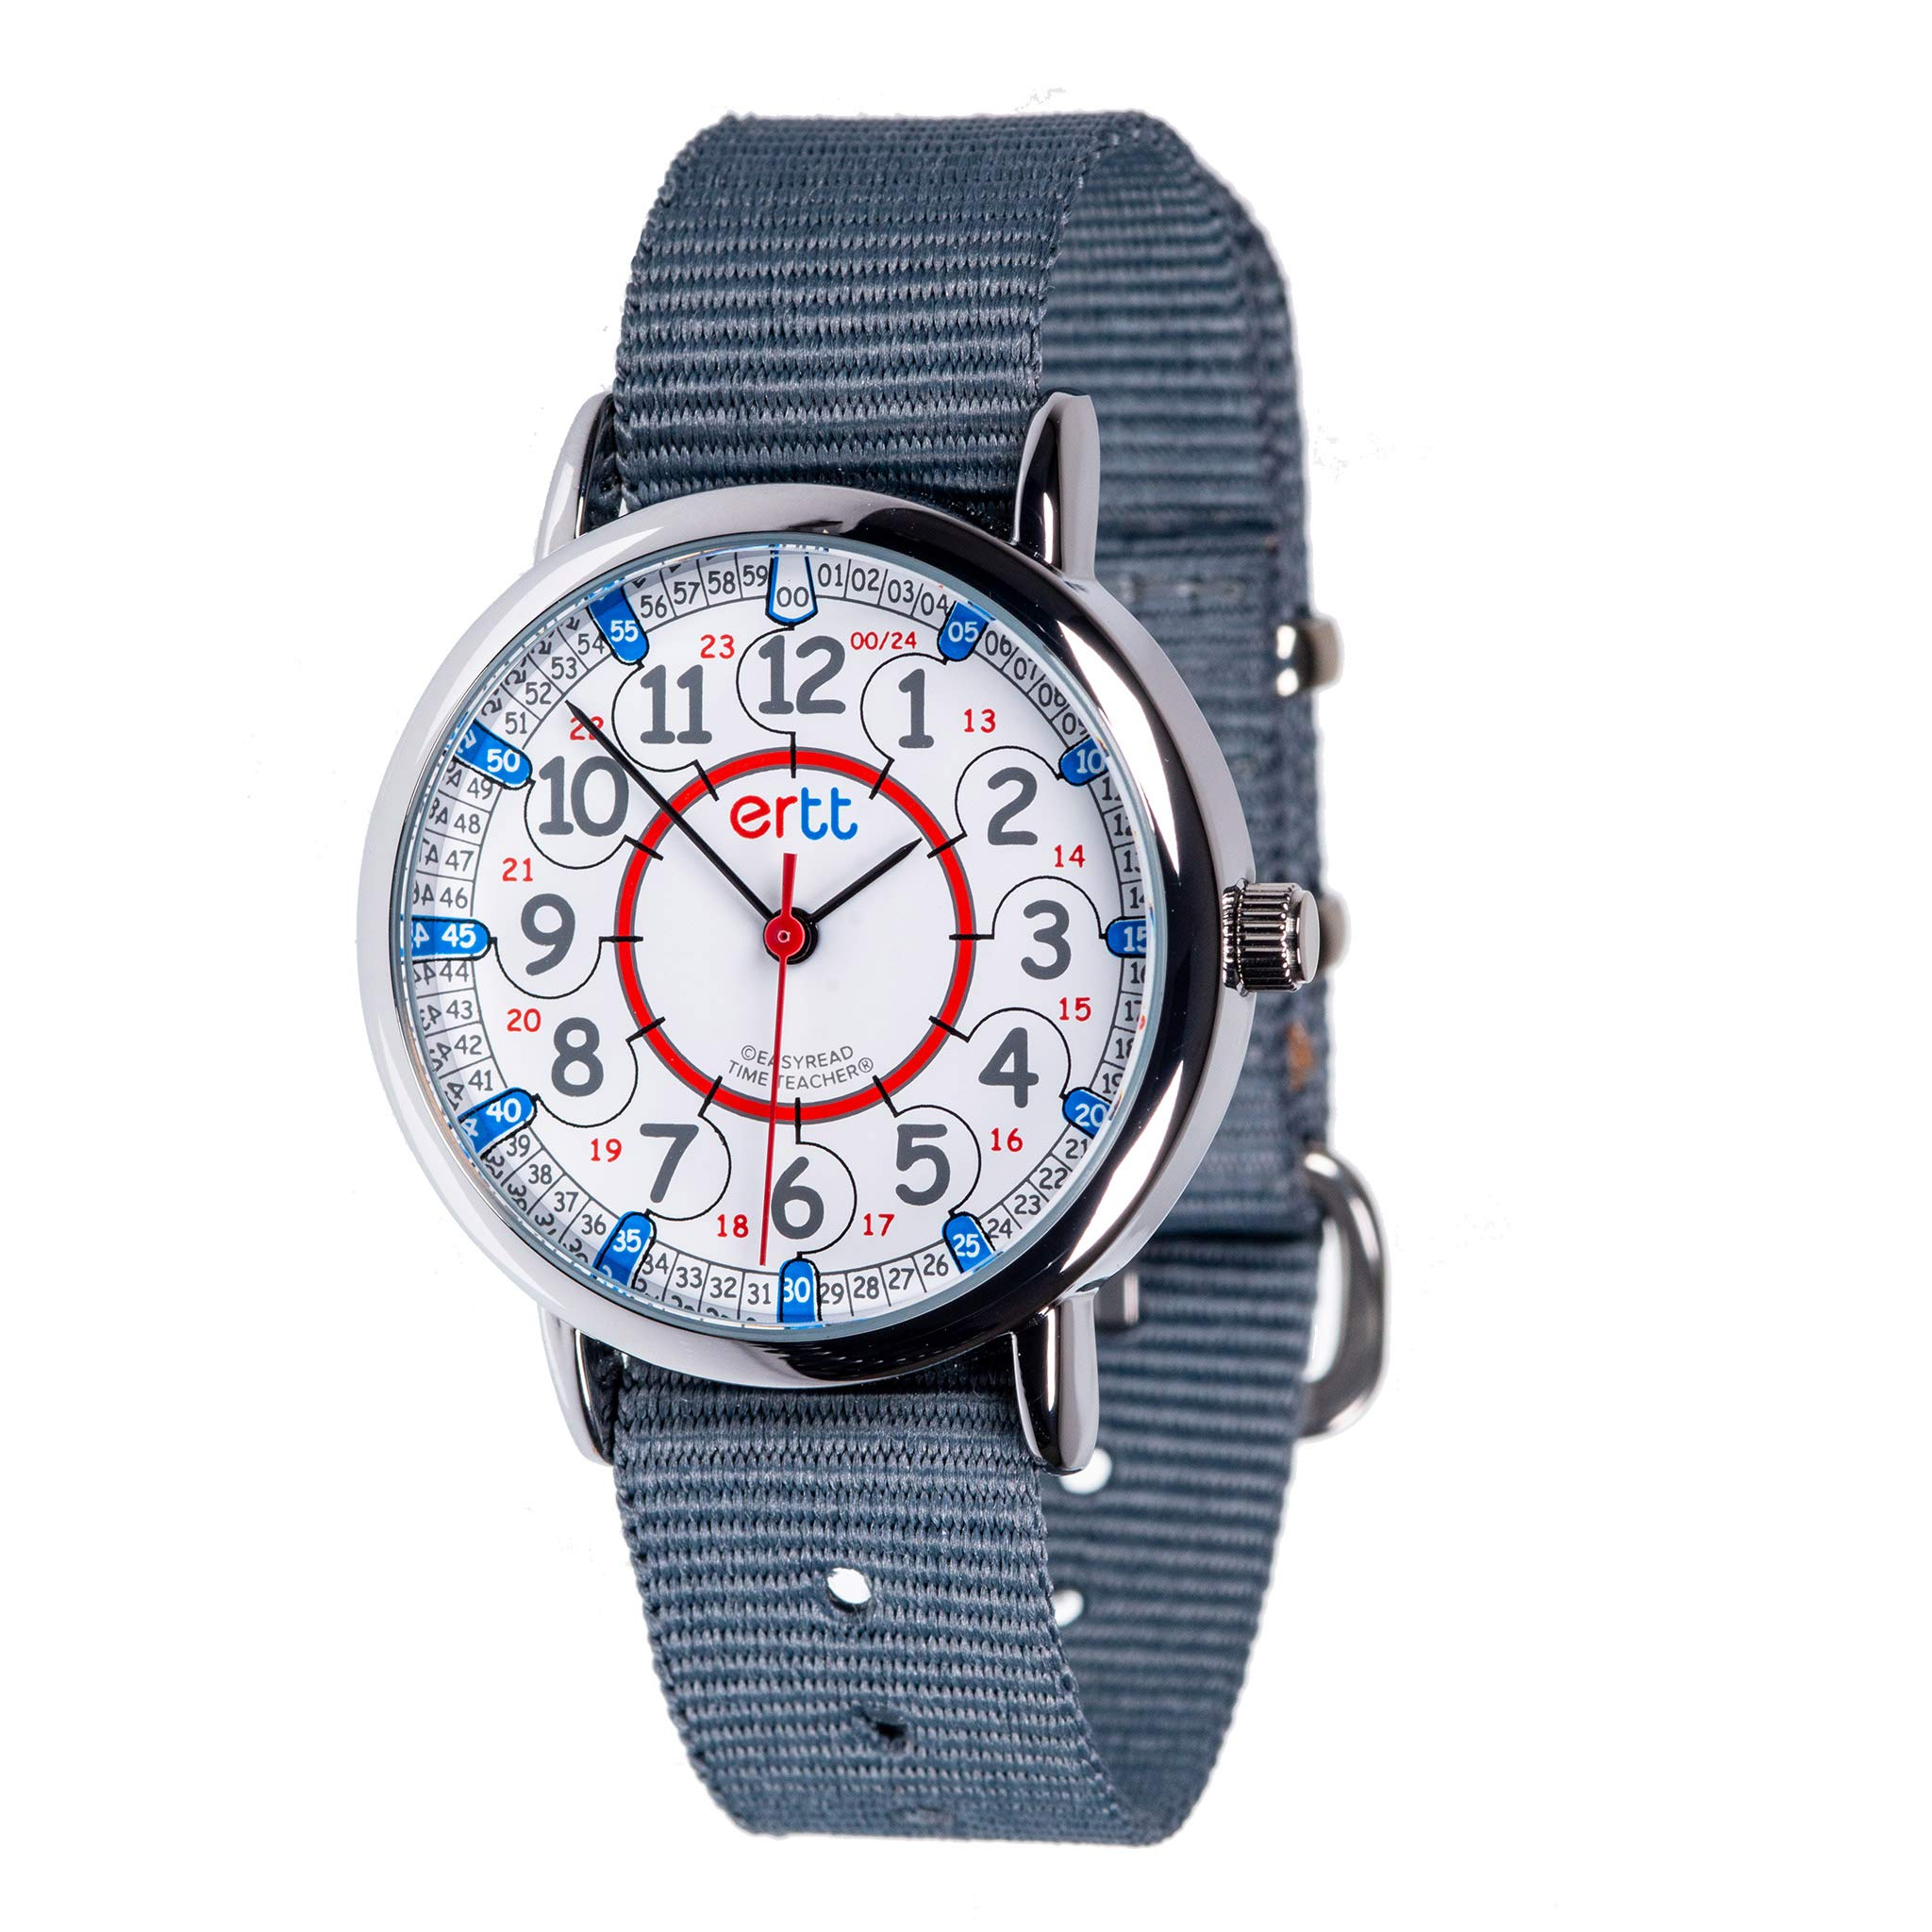 EasyRead Time Teacher Children's Watch, Red Blue 12/24 Hour Face, Grey Strap by EasyRead Time Teacher